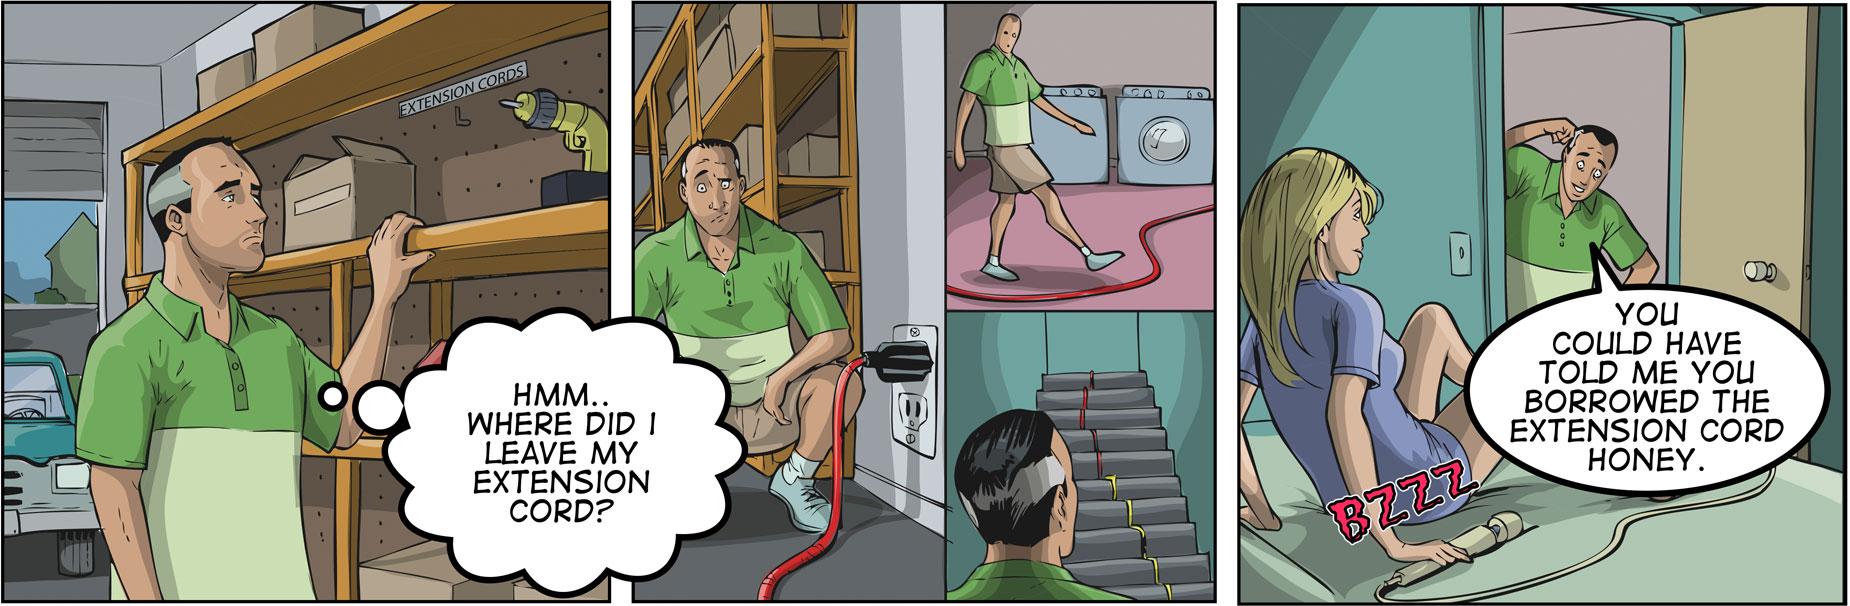 Corded Or Plug-In Vibrators